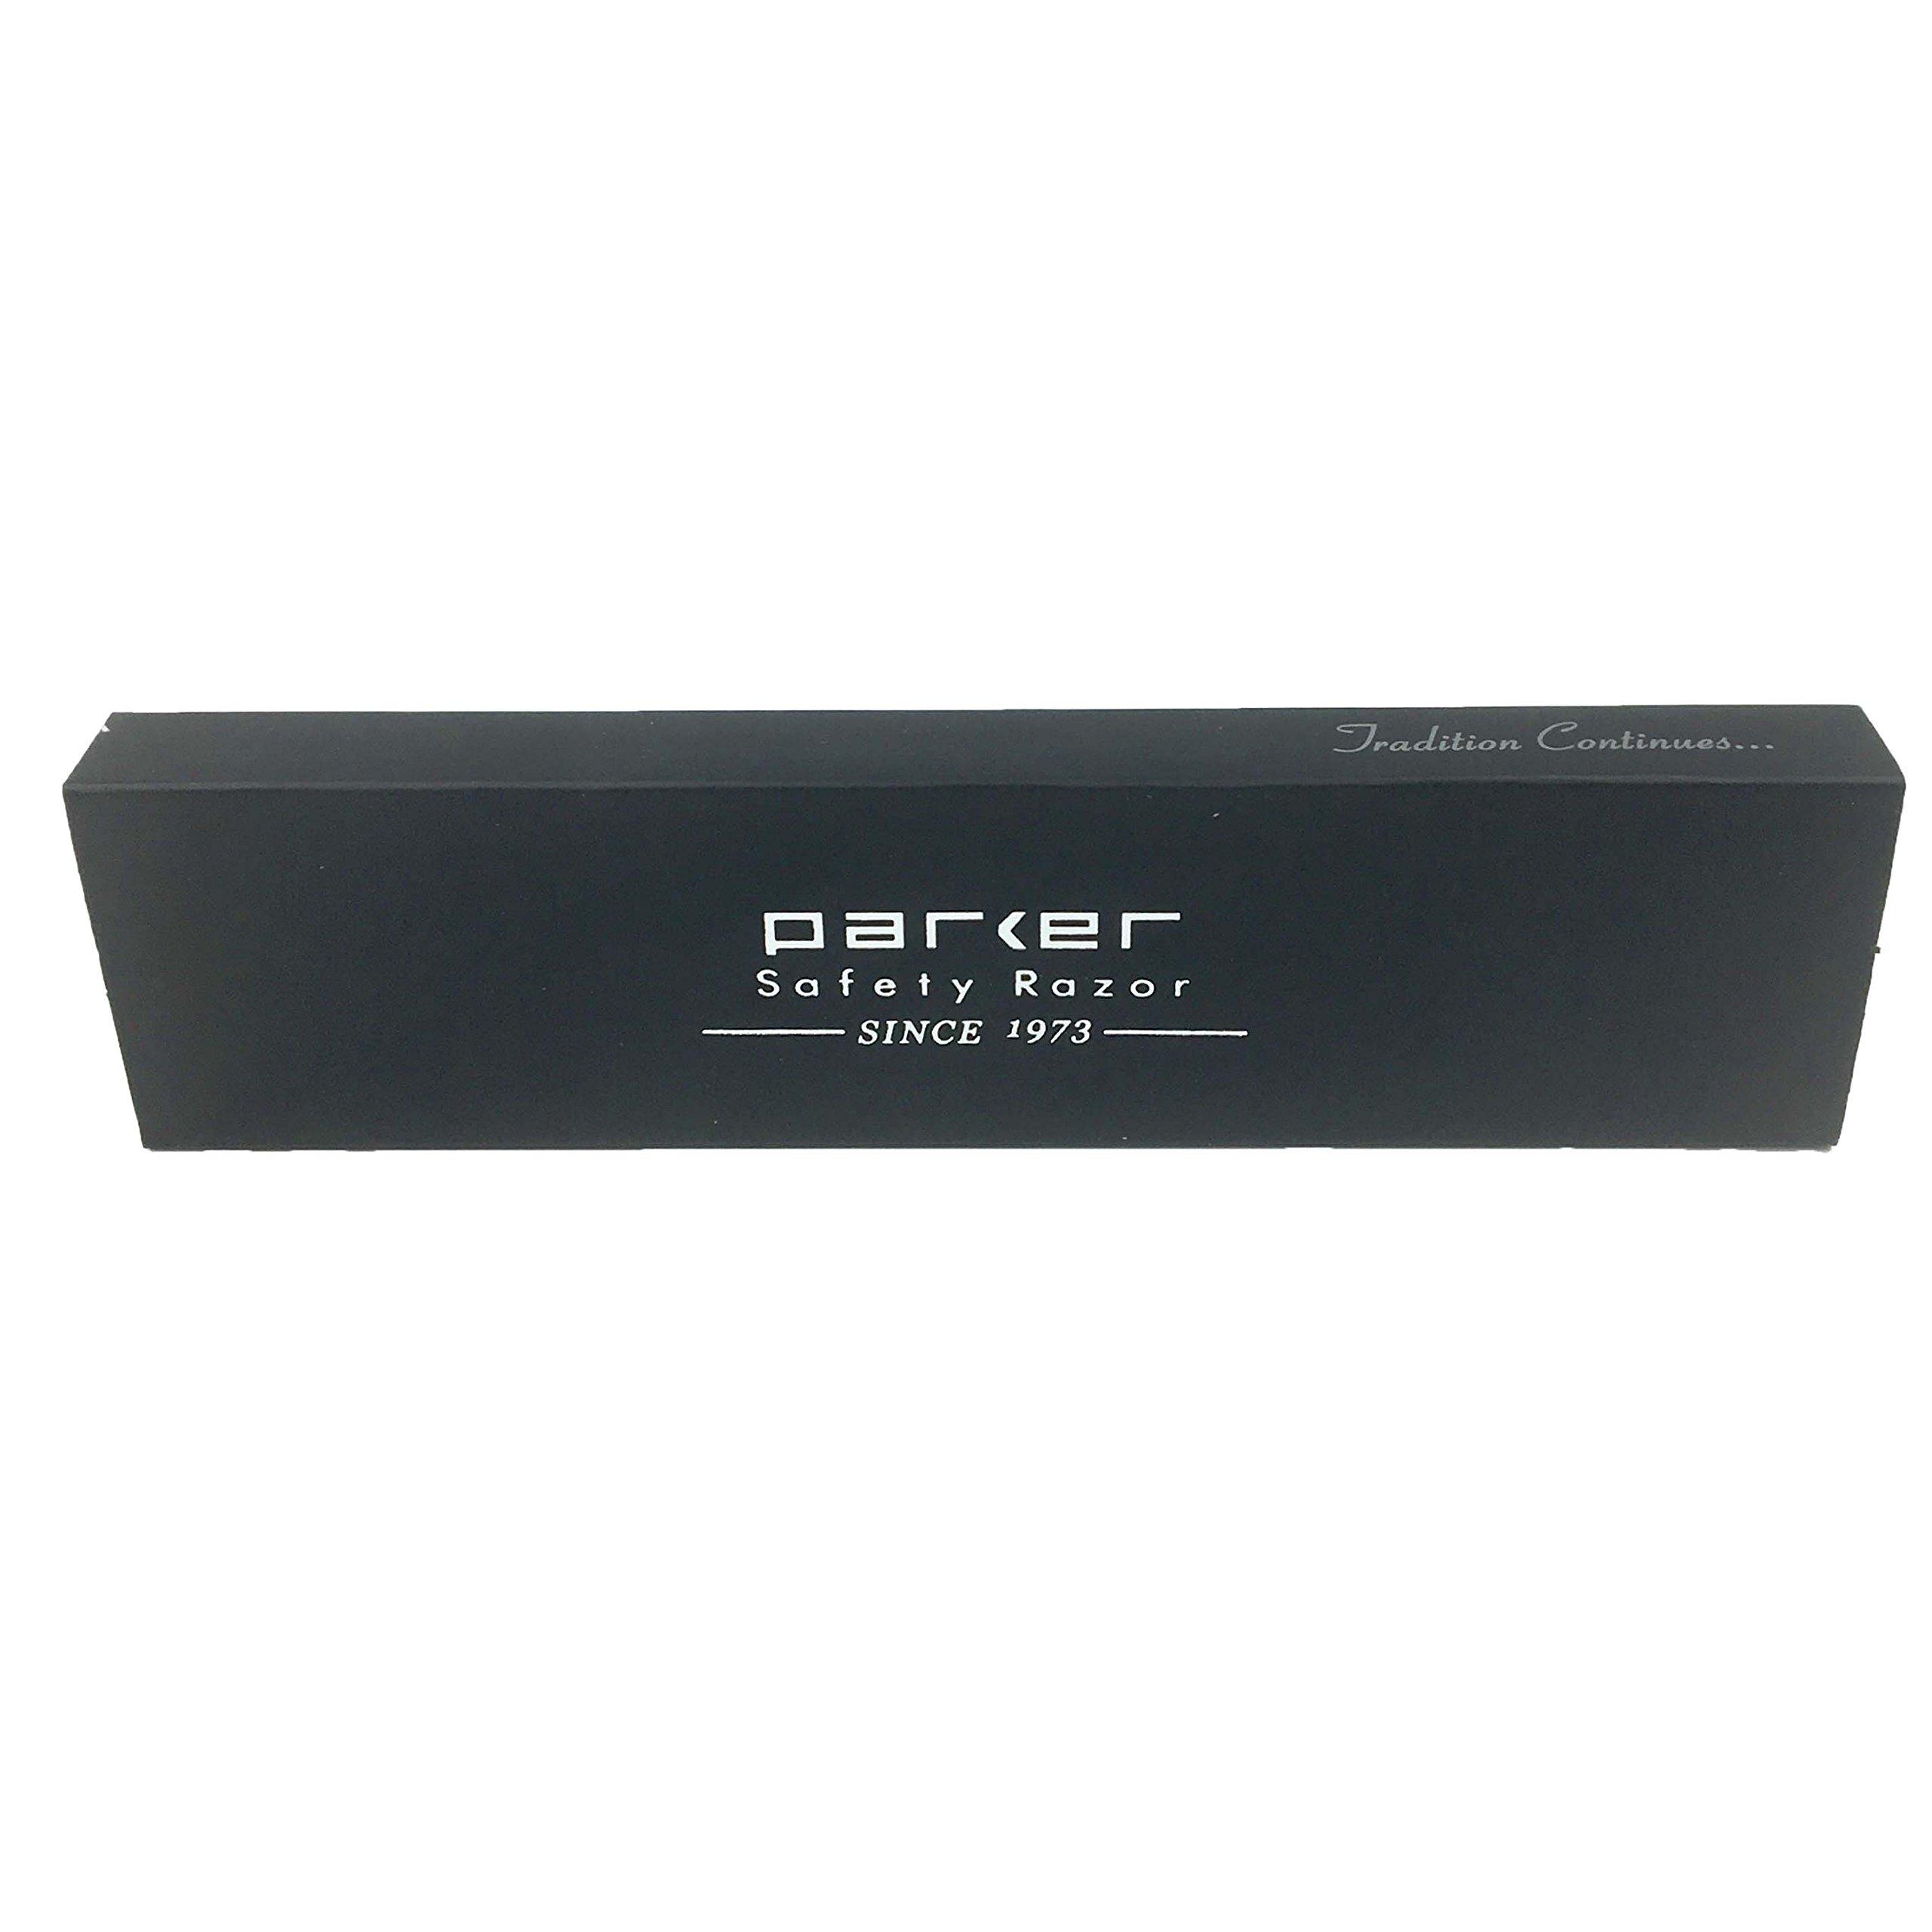 Parker SRB Straight Edge Barber Razor and 5 Shark Stainless Blades